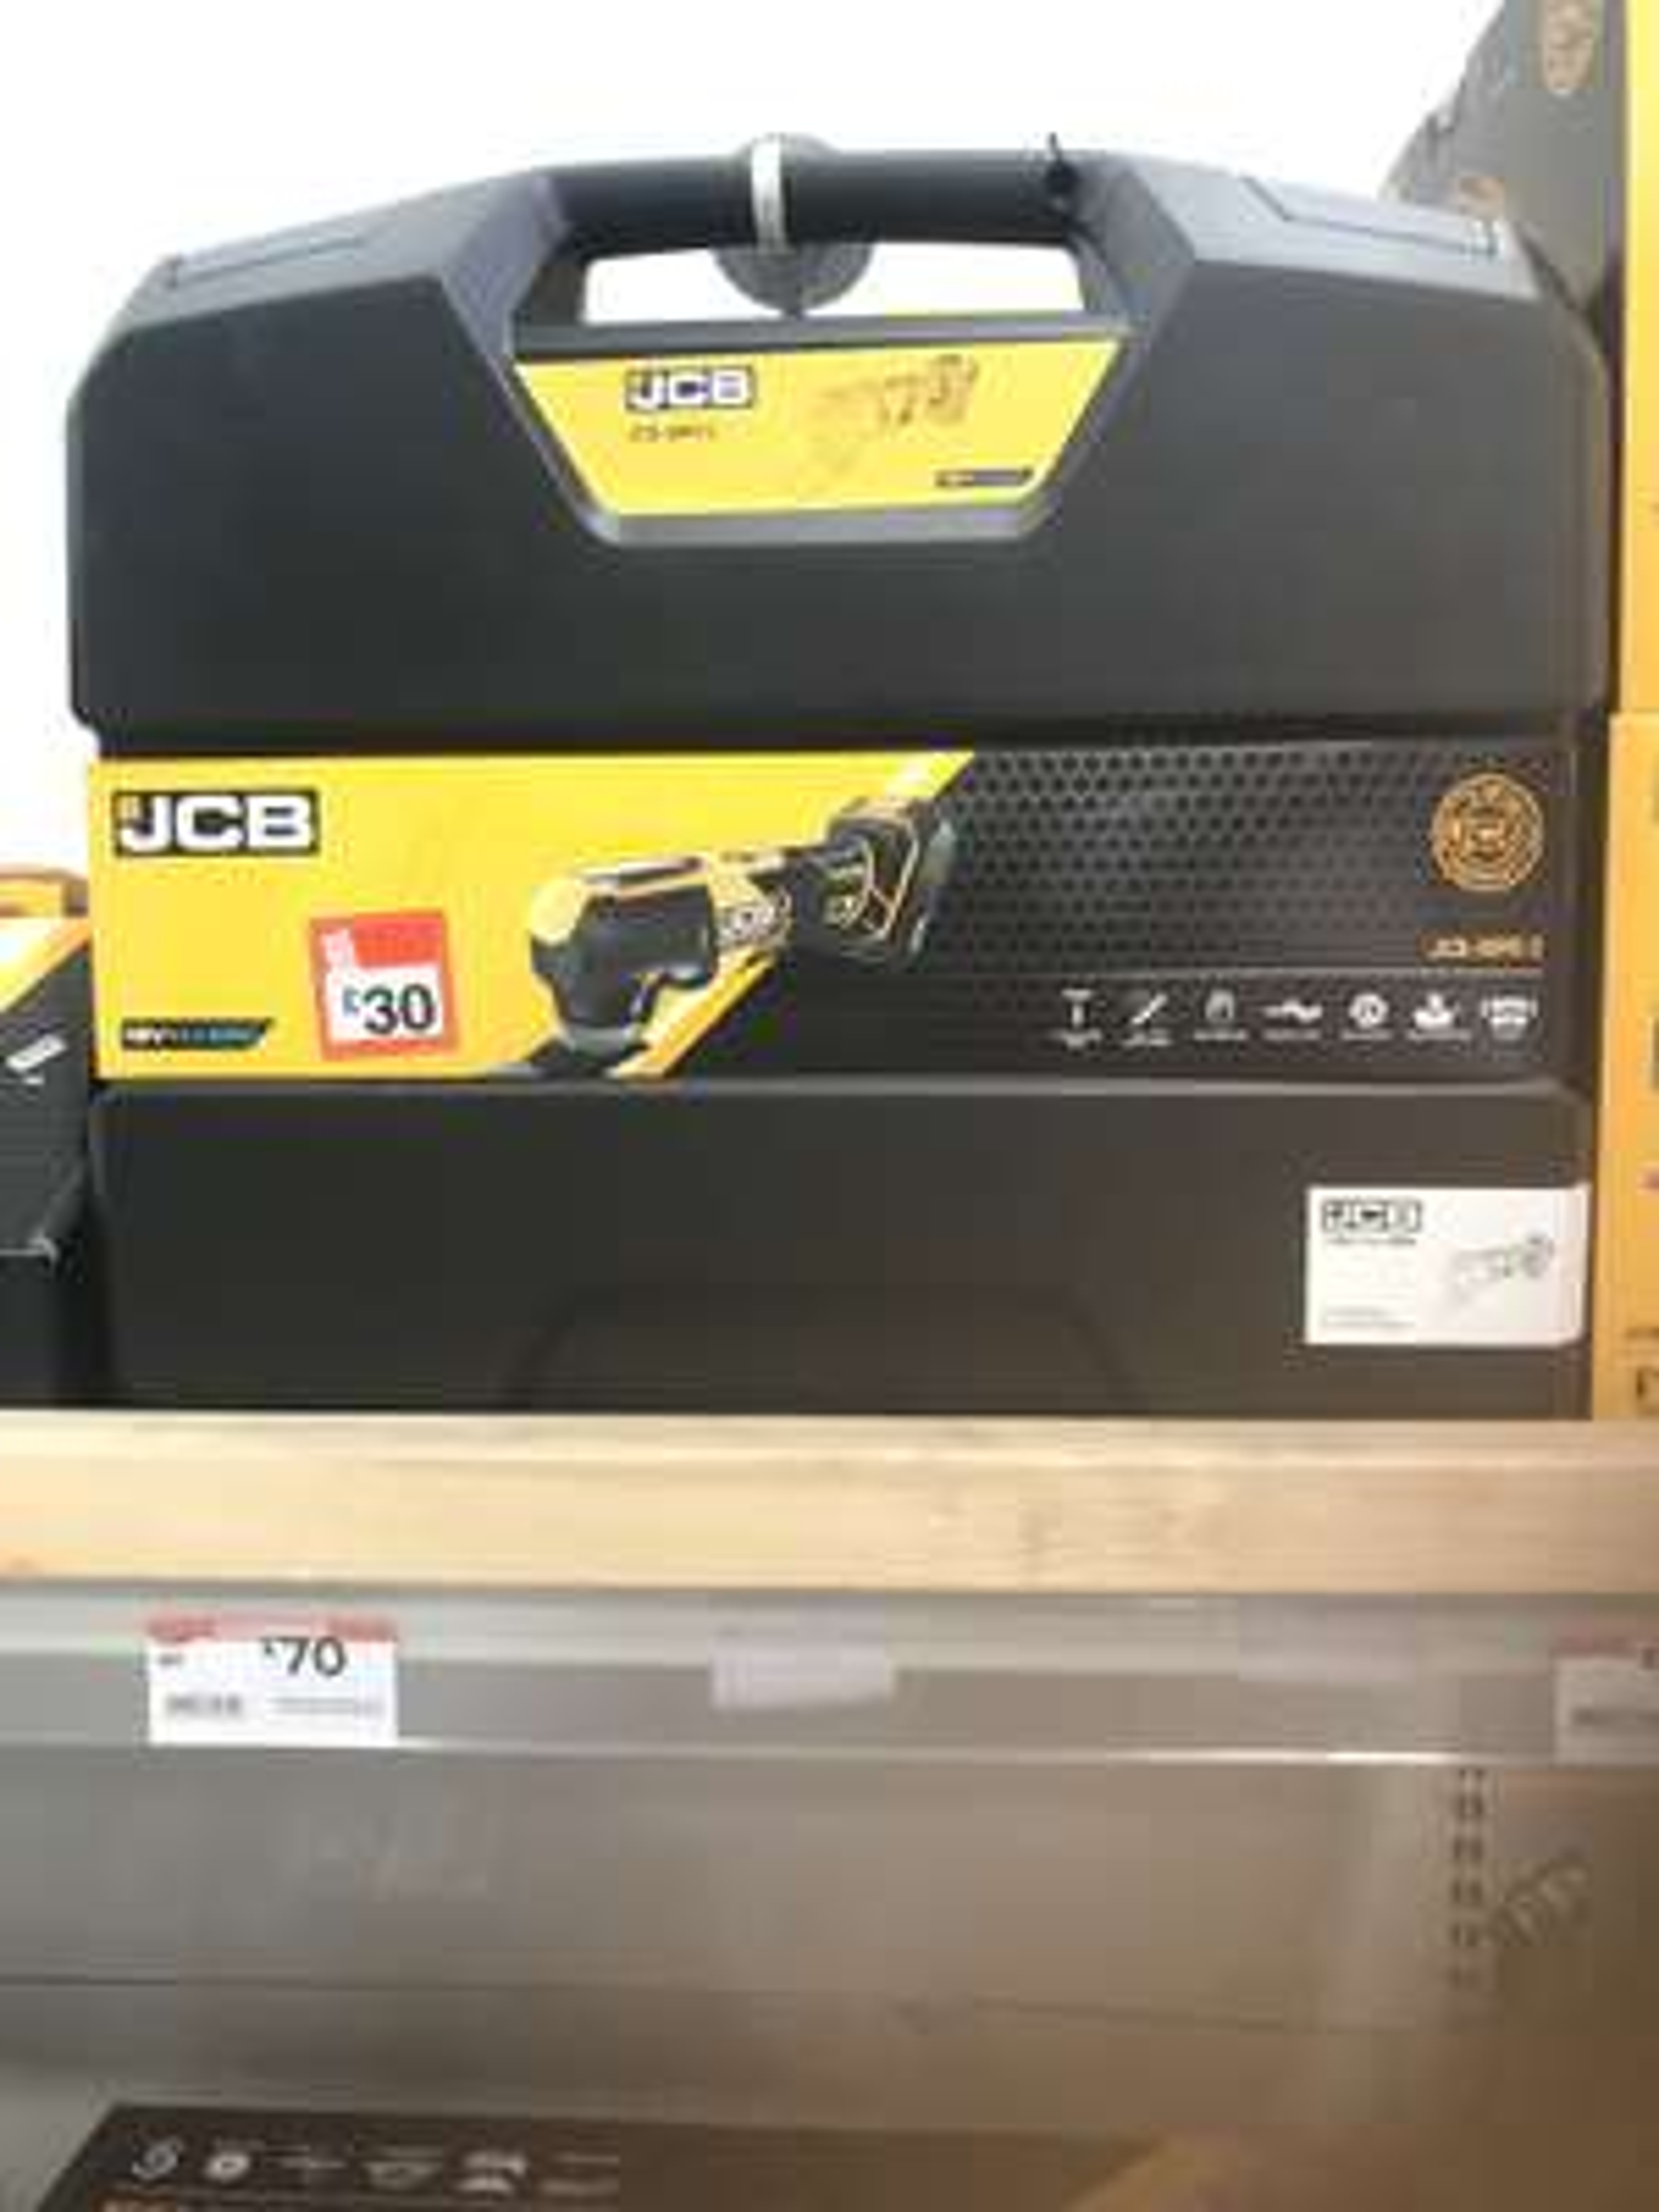 JCB Cordless Multi-cutter tool 18V 5Ah £30 @ B&Q (Derby)